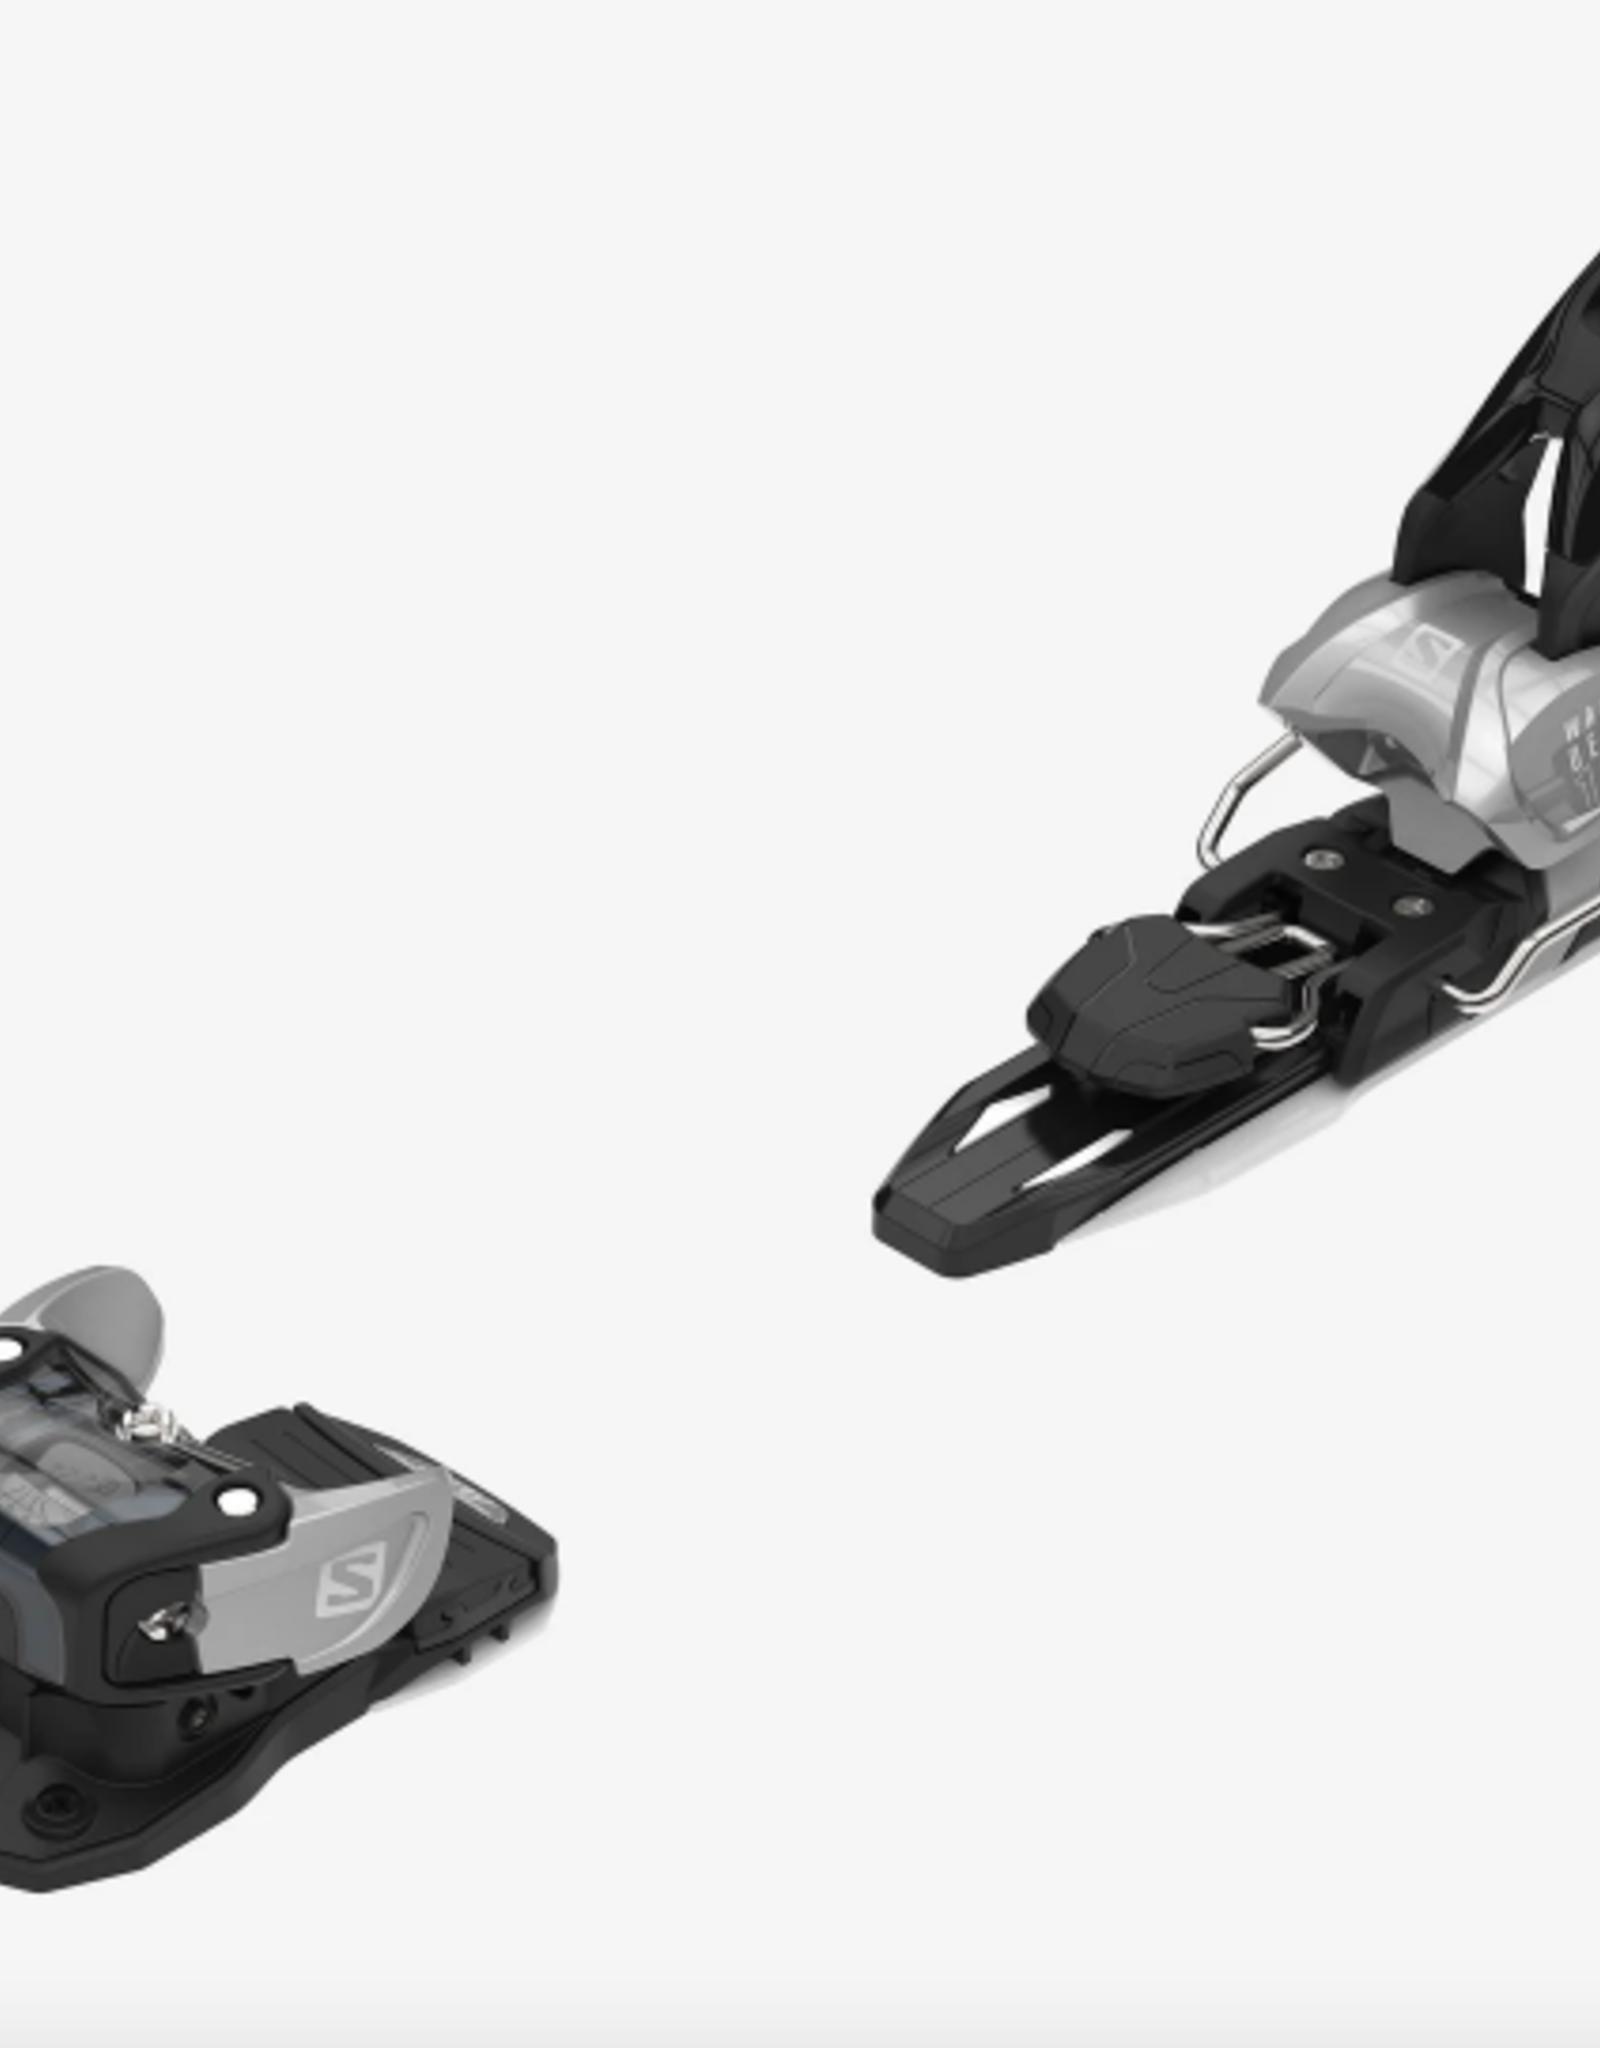 Salomon Warden MNC 11 Ski Bindings Silver/Black 2022